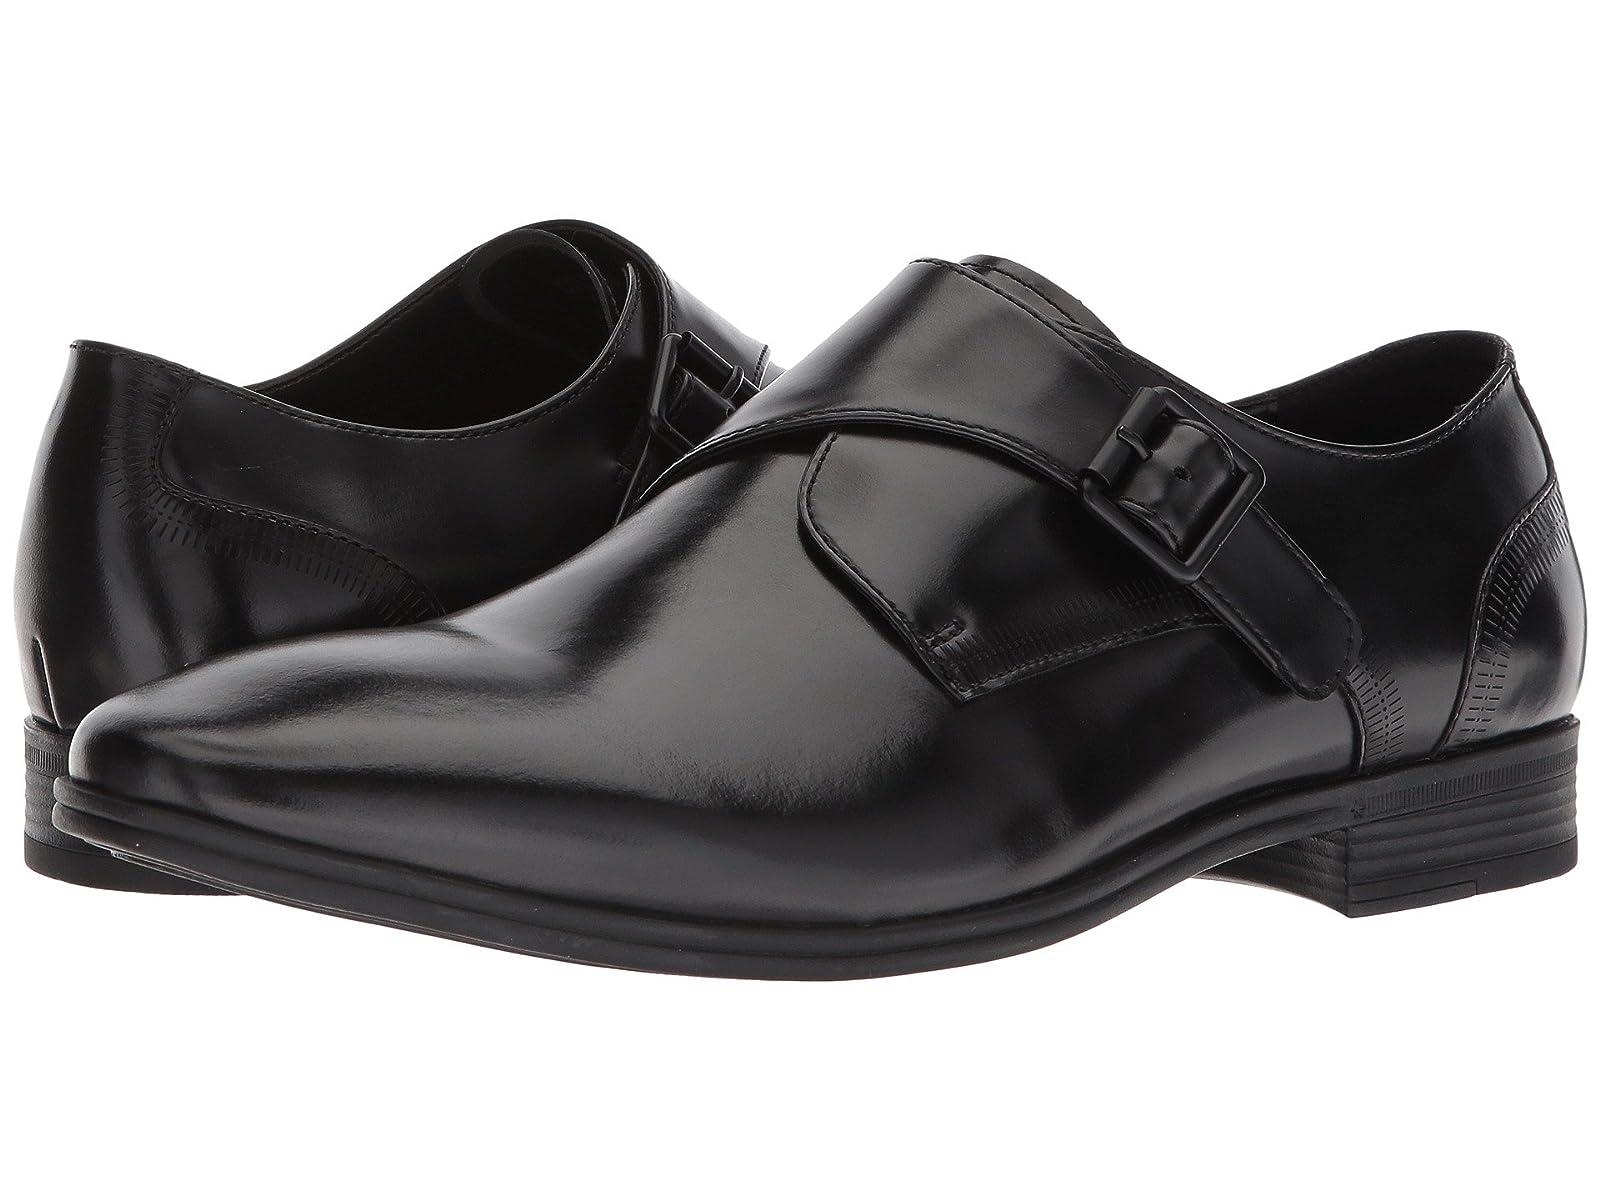 Kenneth Cole Reaction Min MonkAtmospheric grades have affordable shoes